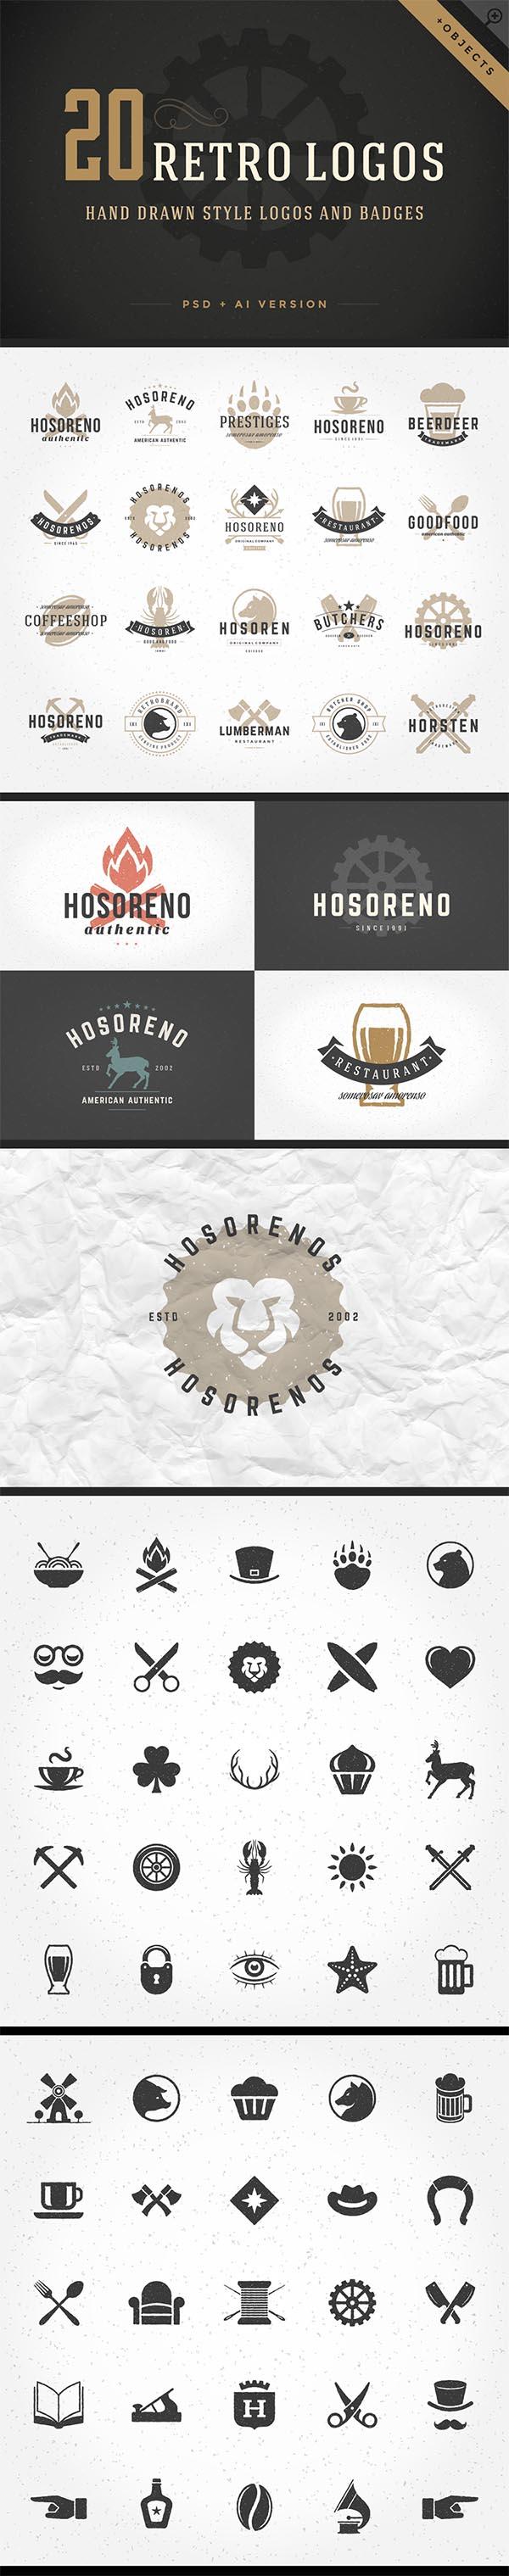 700 Retro Vintage Logotypes and Badges - 5